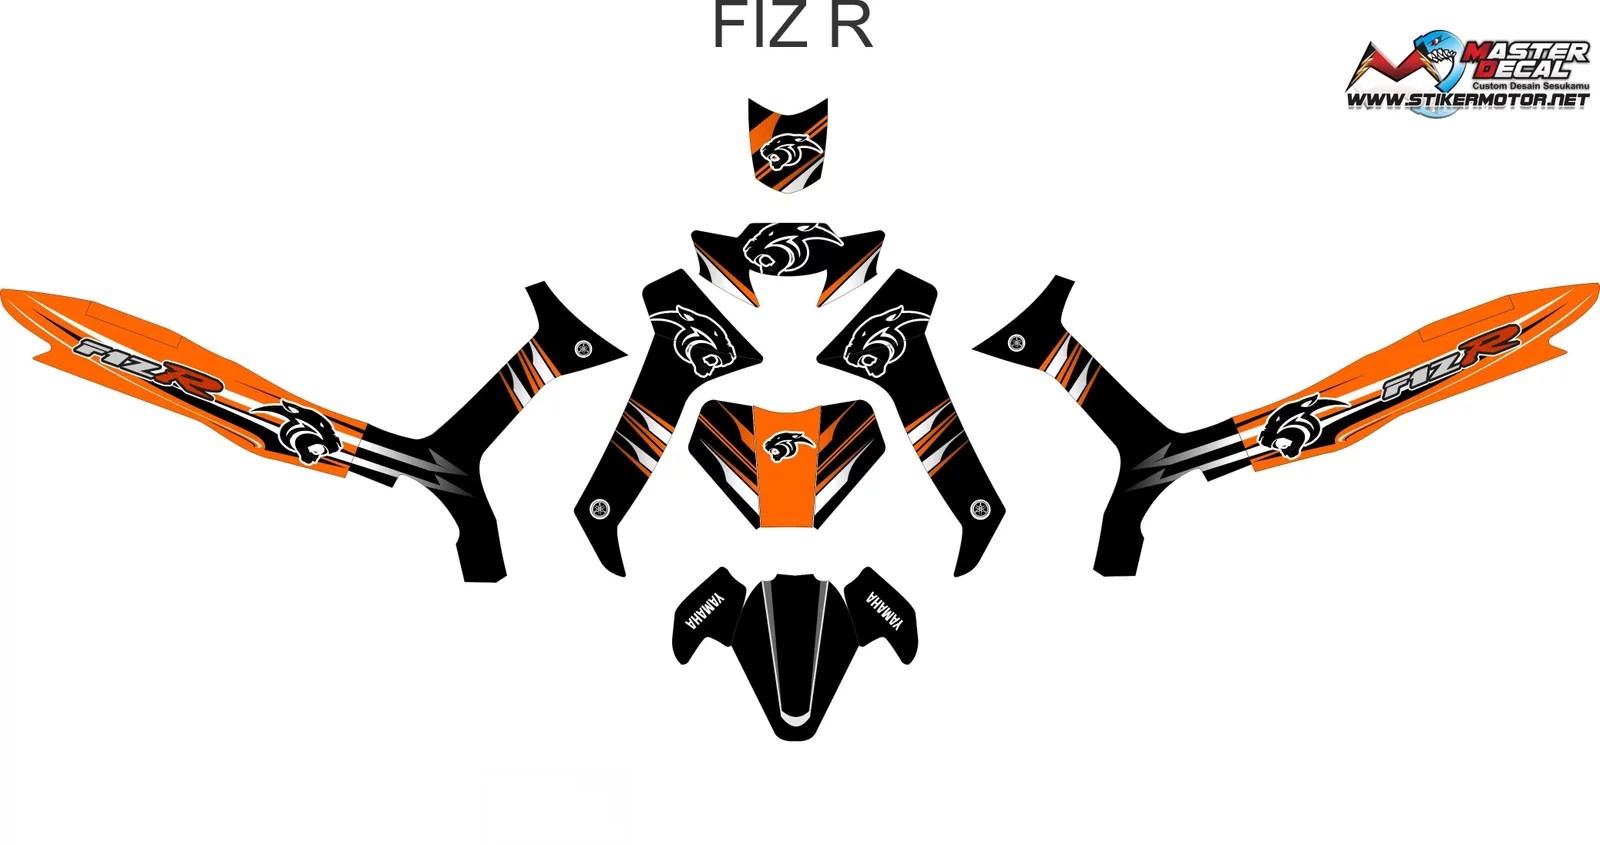 Fiz r archives stikermotor net customize without limit